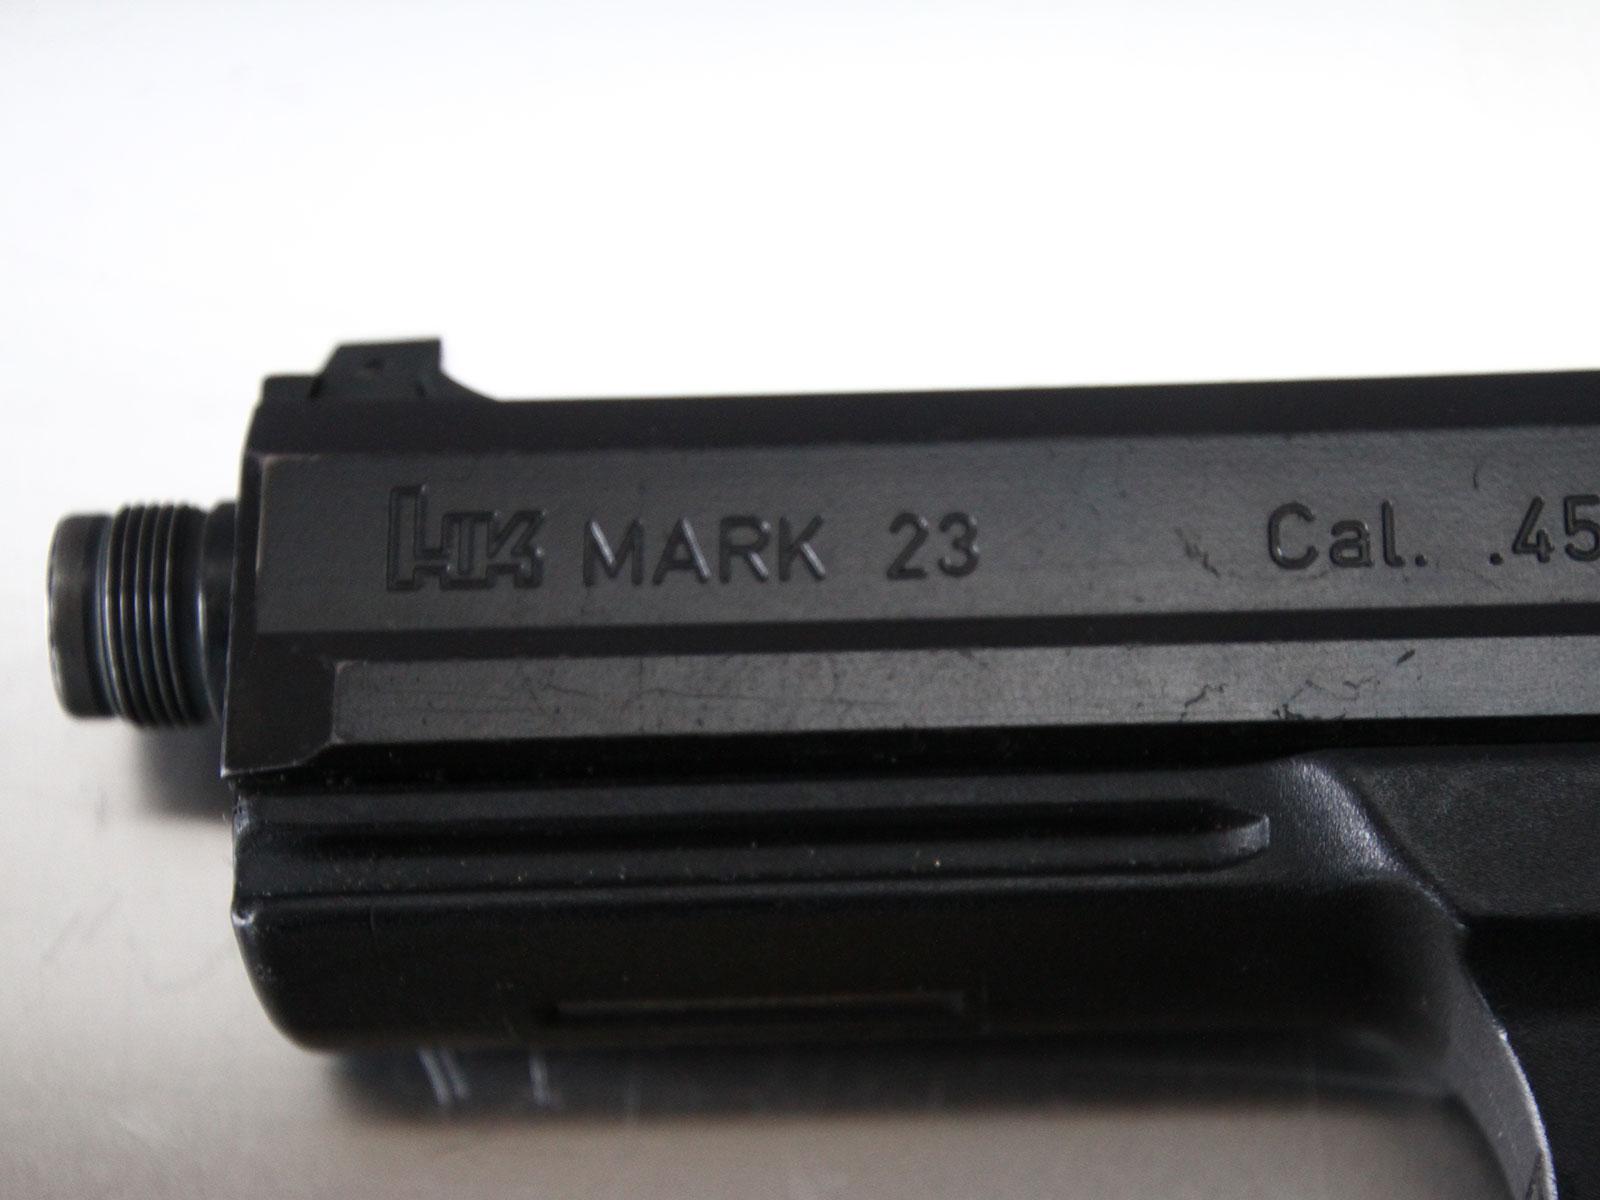 SH_Web_Wir_Waffen_HK-MARK-23-2_1800x1200